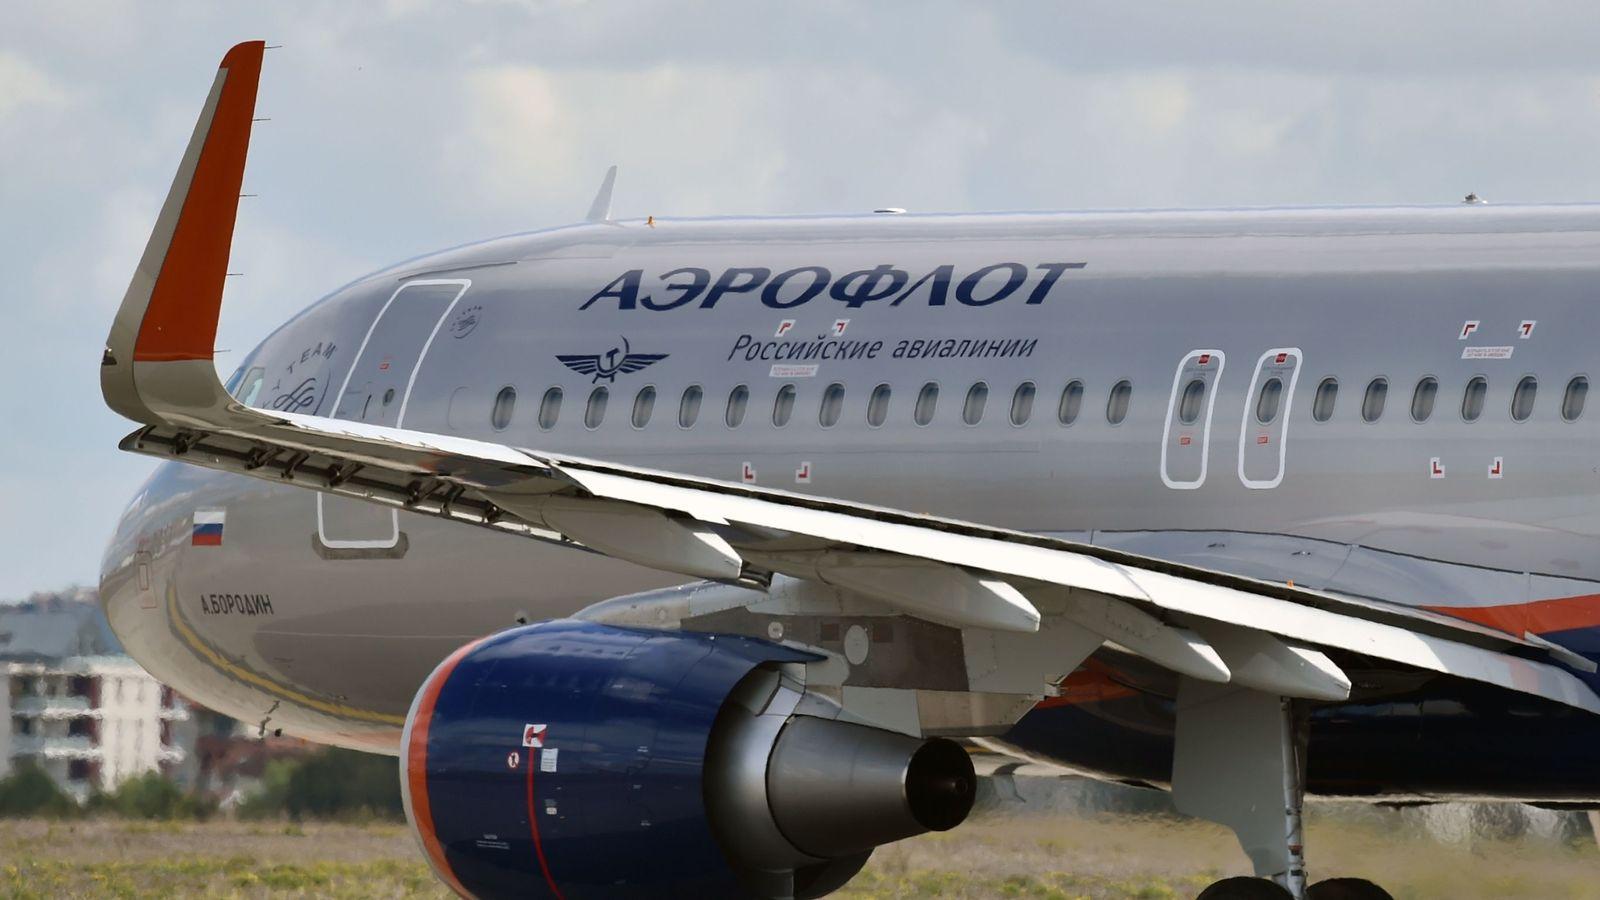 'Drunk man' demands flight to Afghanistan in 'hijacking'